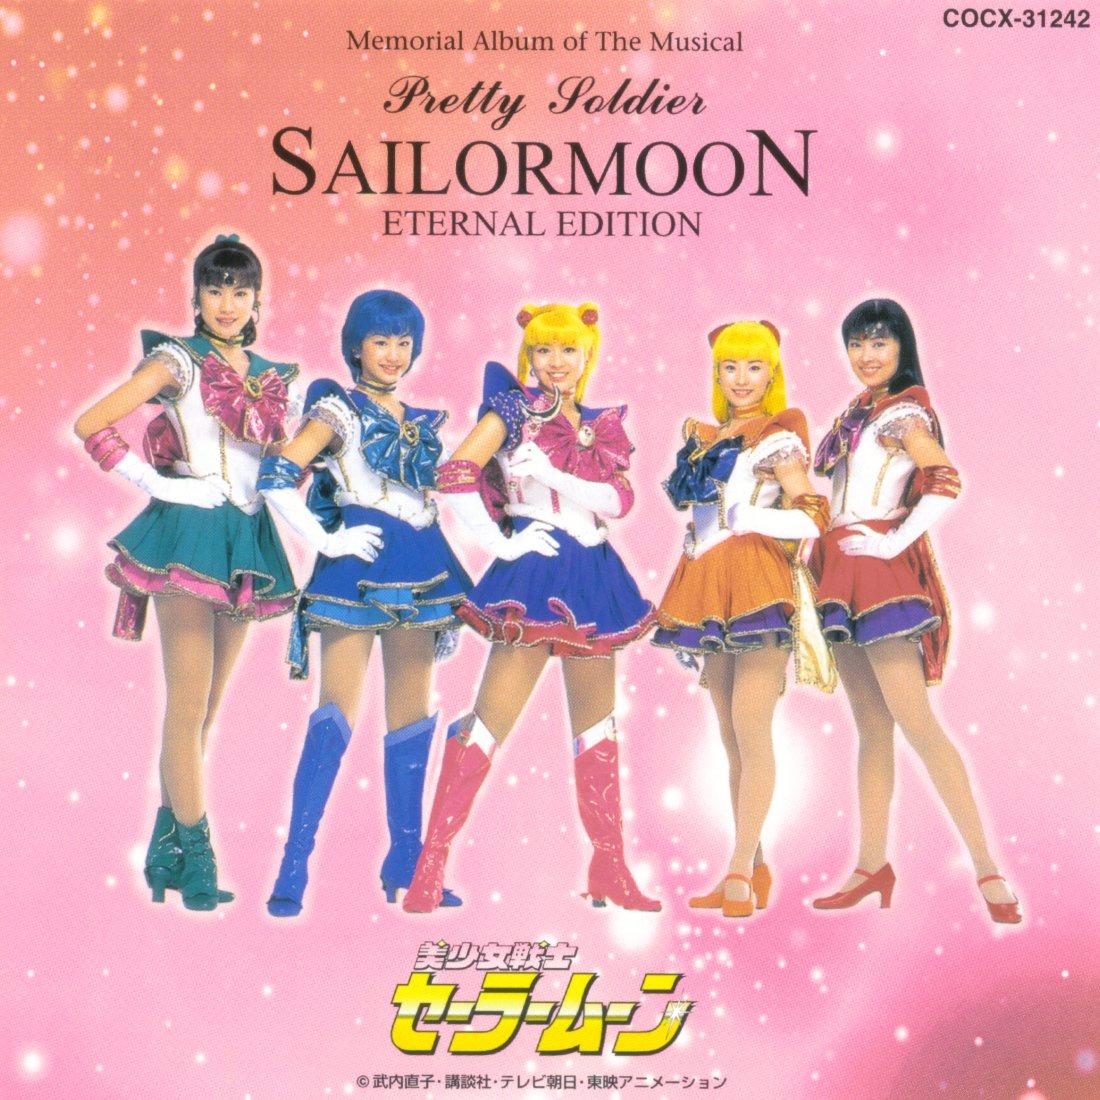 Memorial Album of the Musical - Pretty Soldier Sailor Moon - Eternal Edition